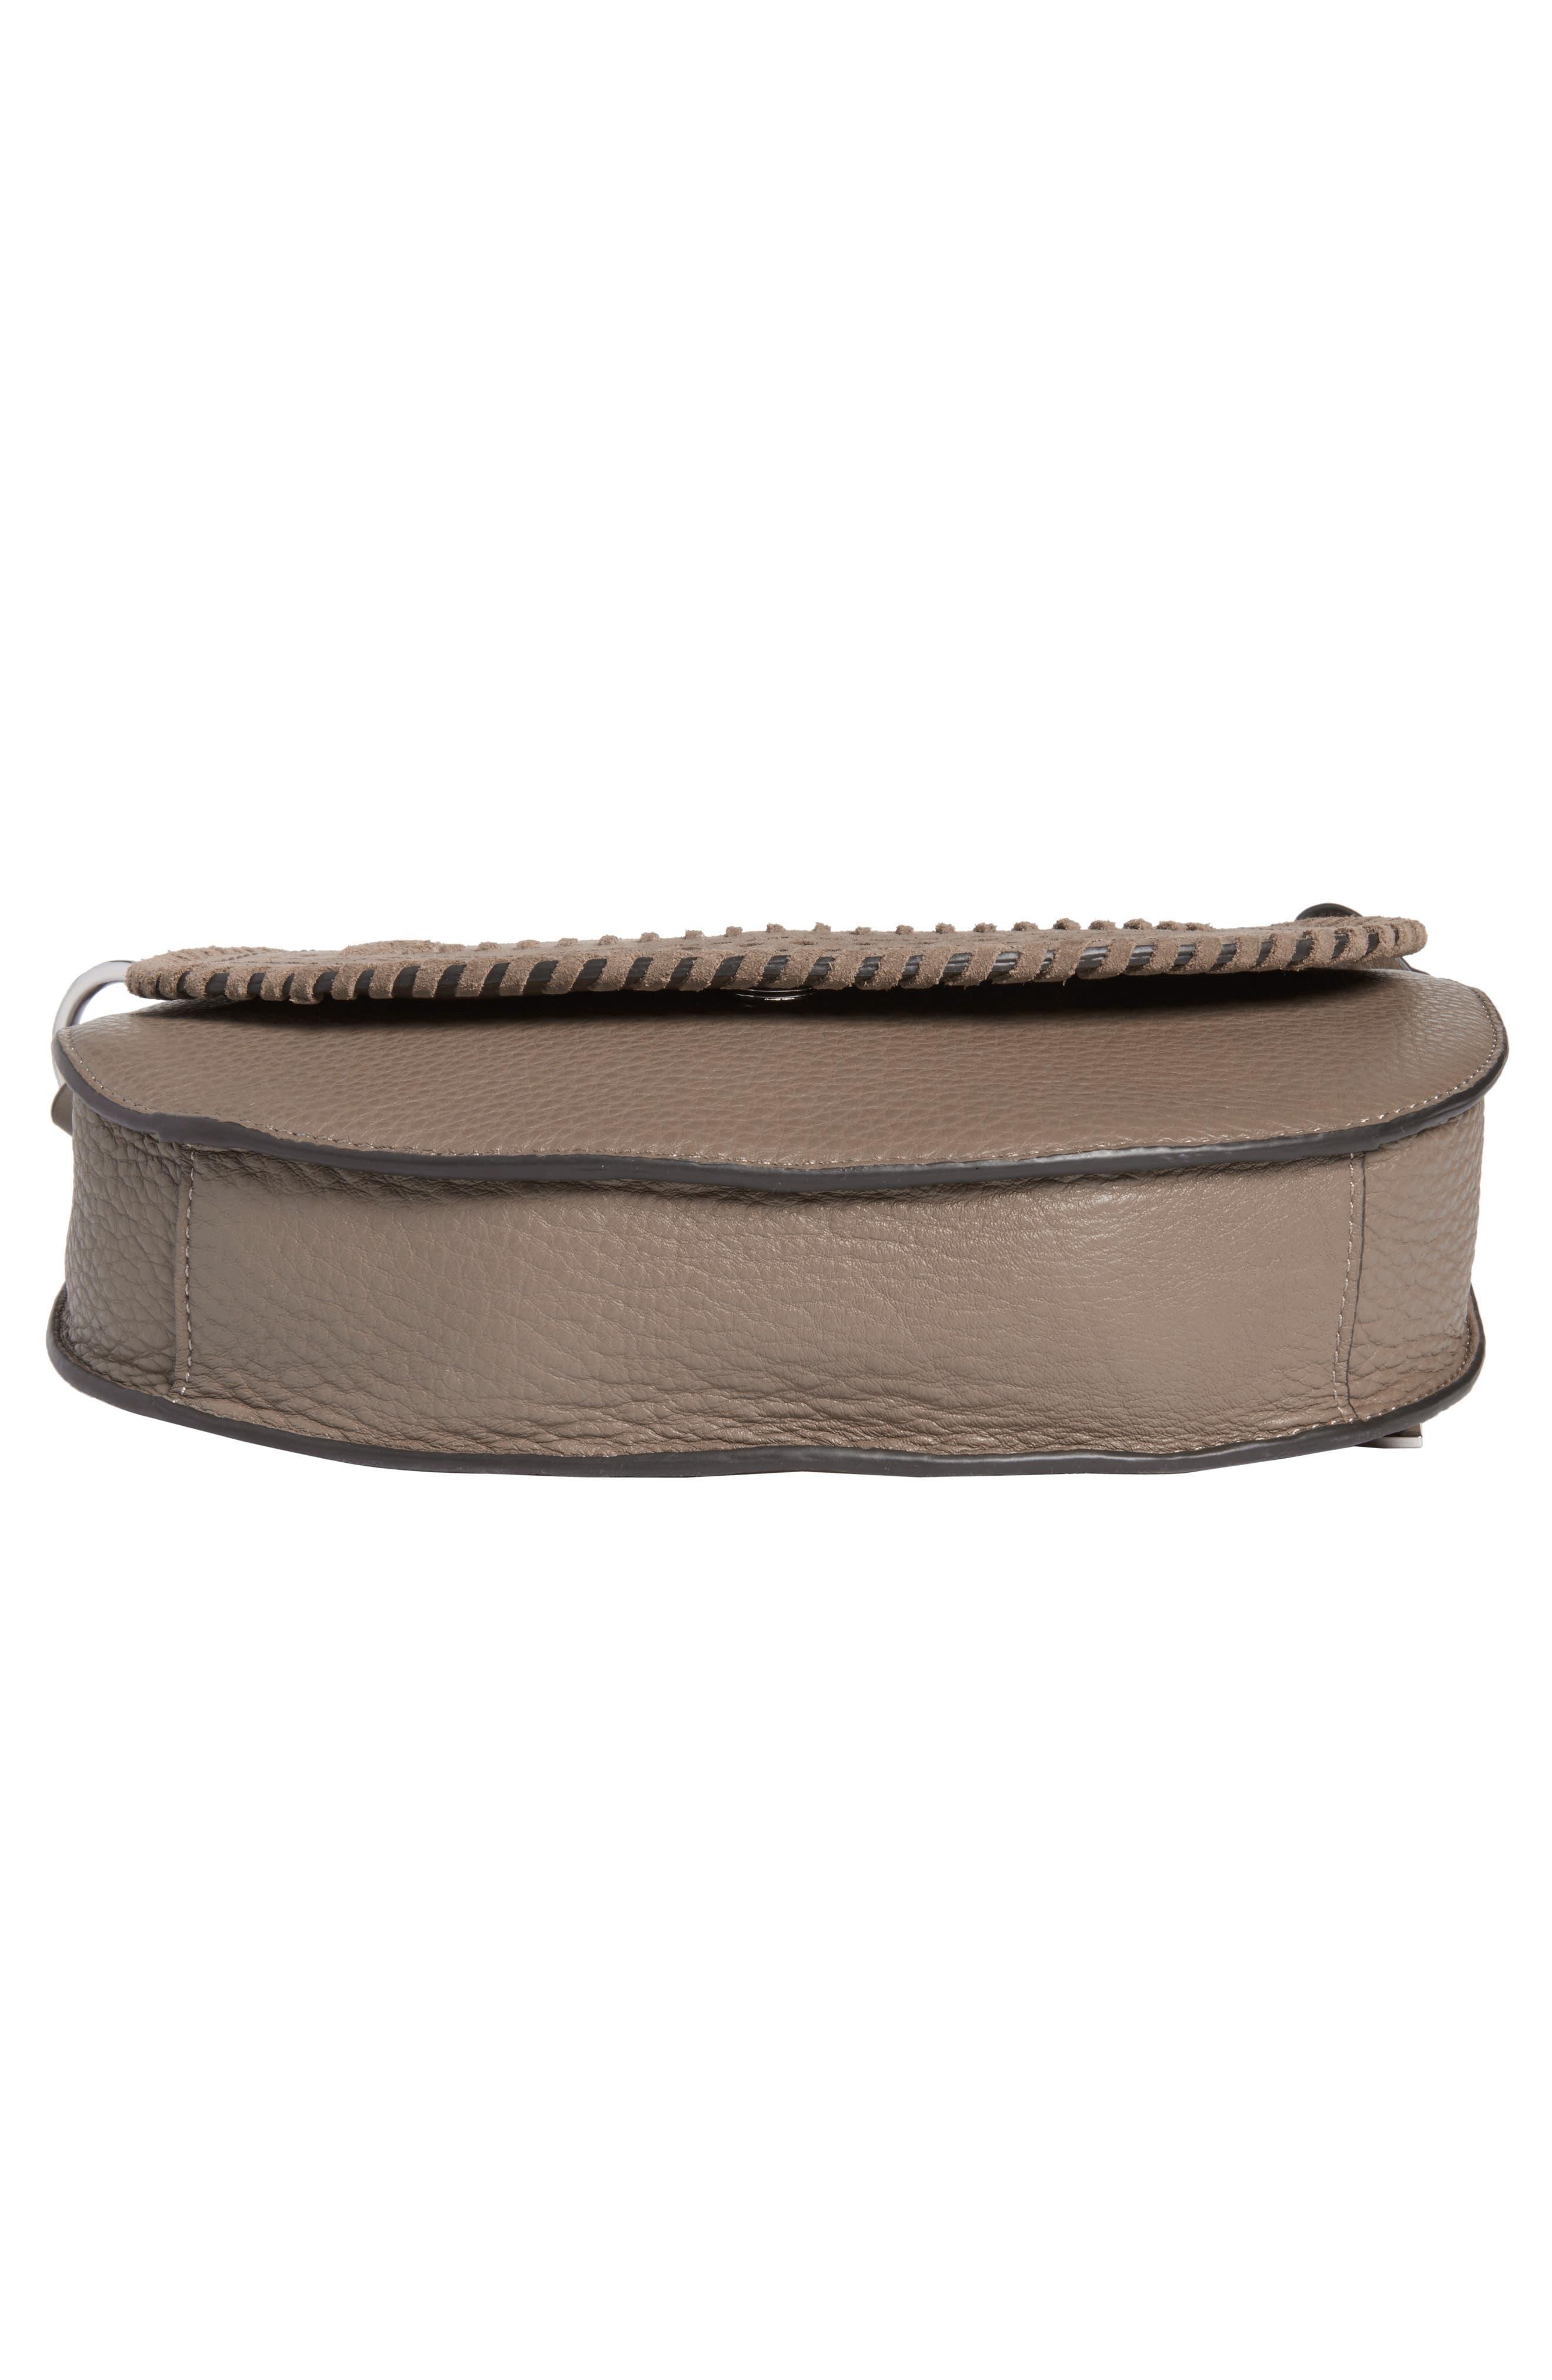 Kirie Suede & Leather Crossbody Saddle Bag,                             Alternate thumbnail 6, color,                             020